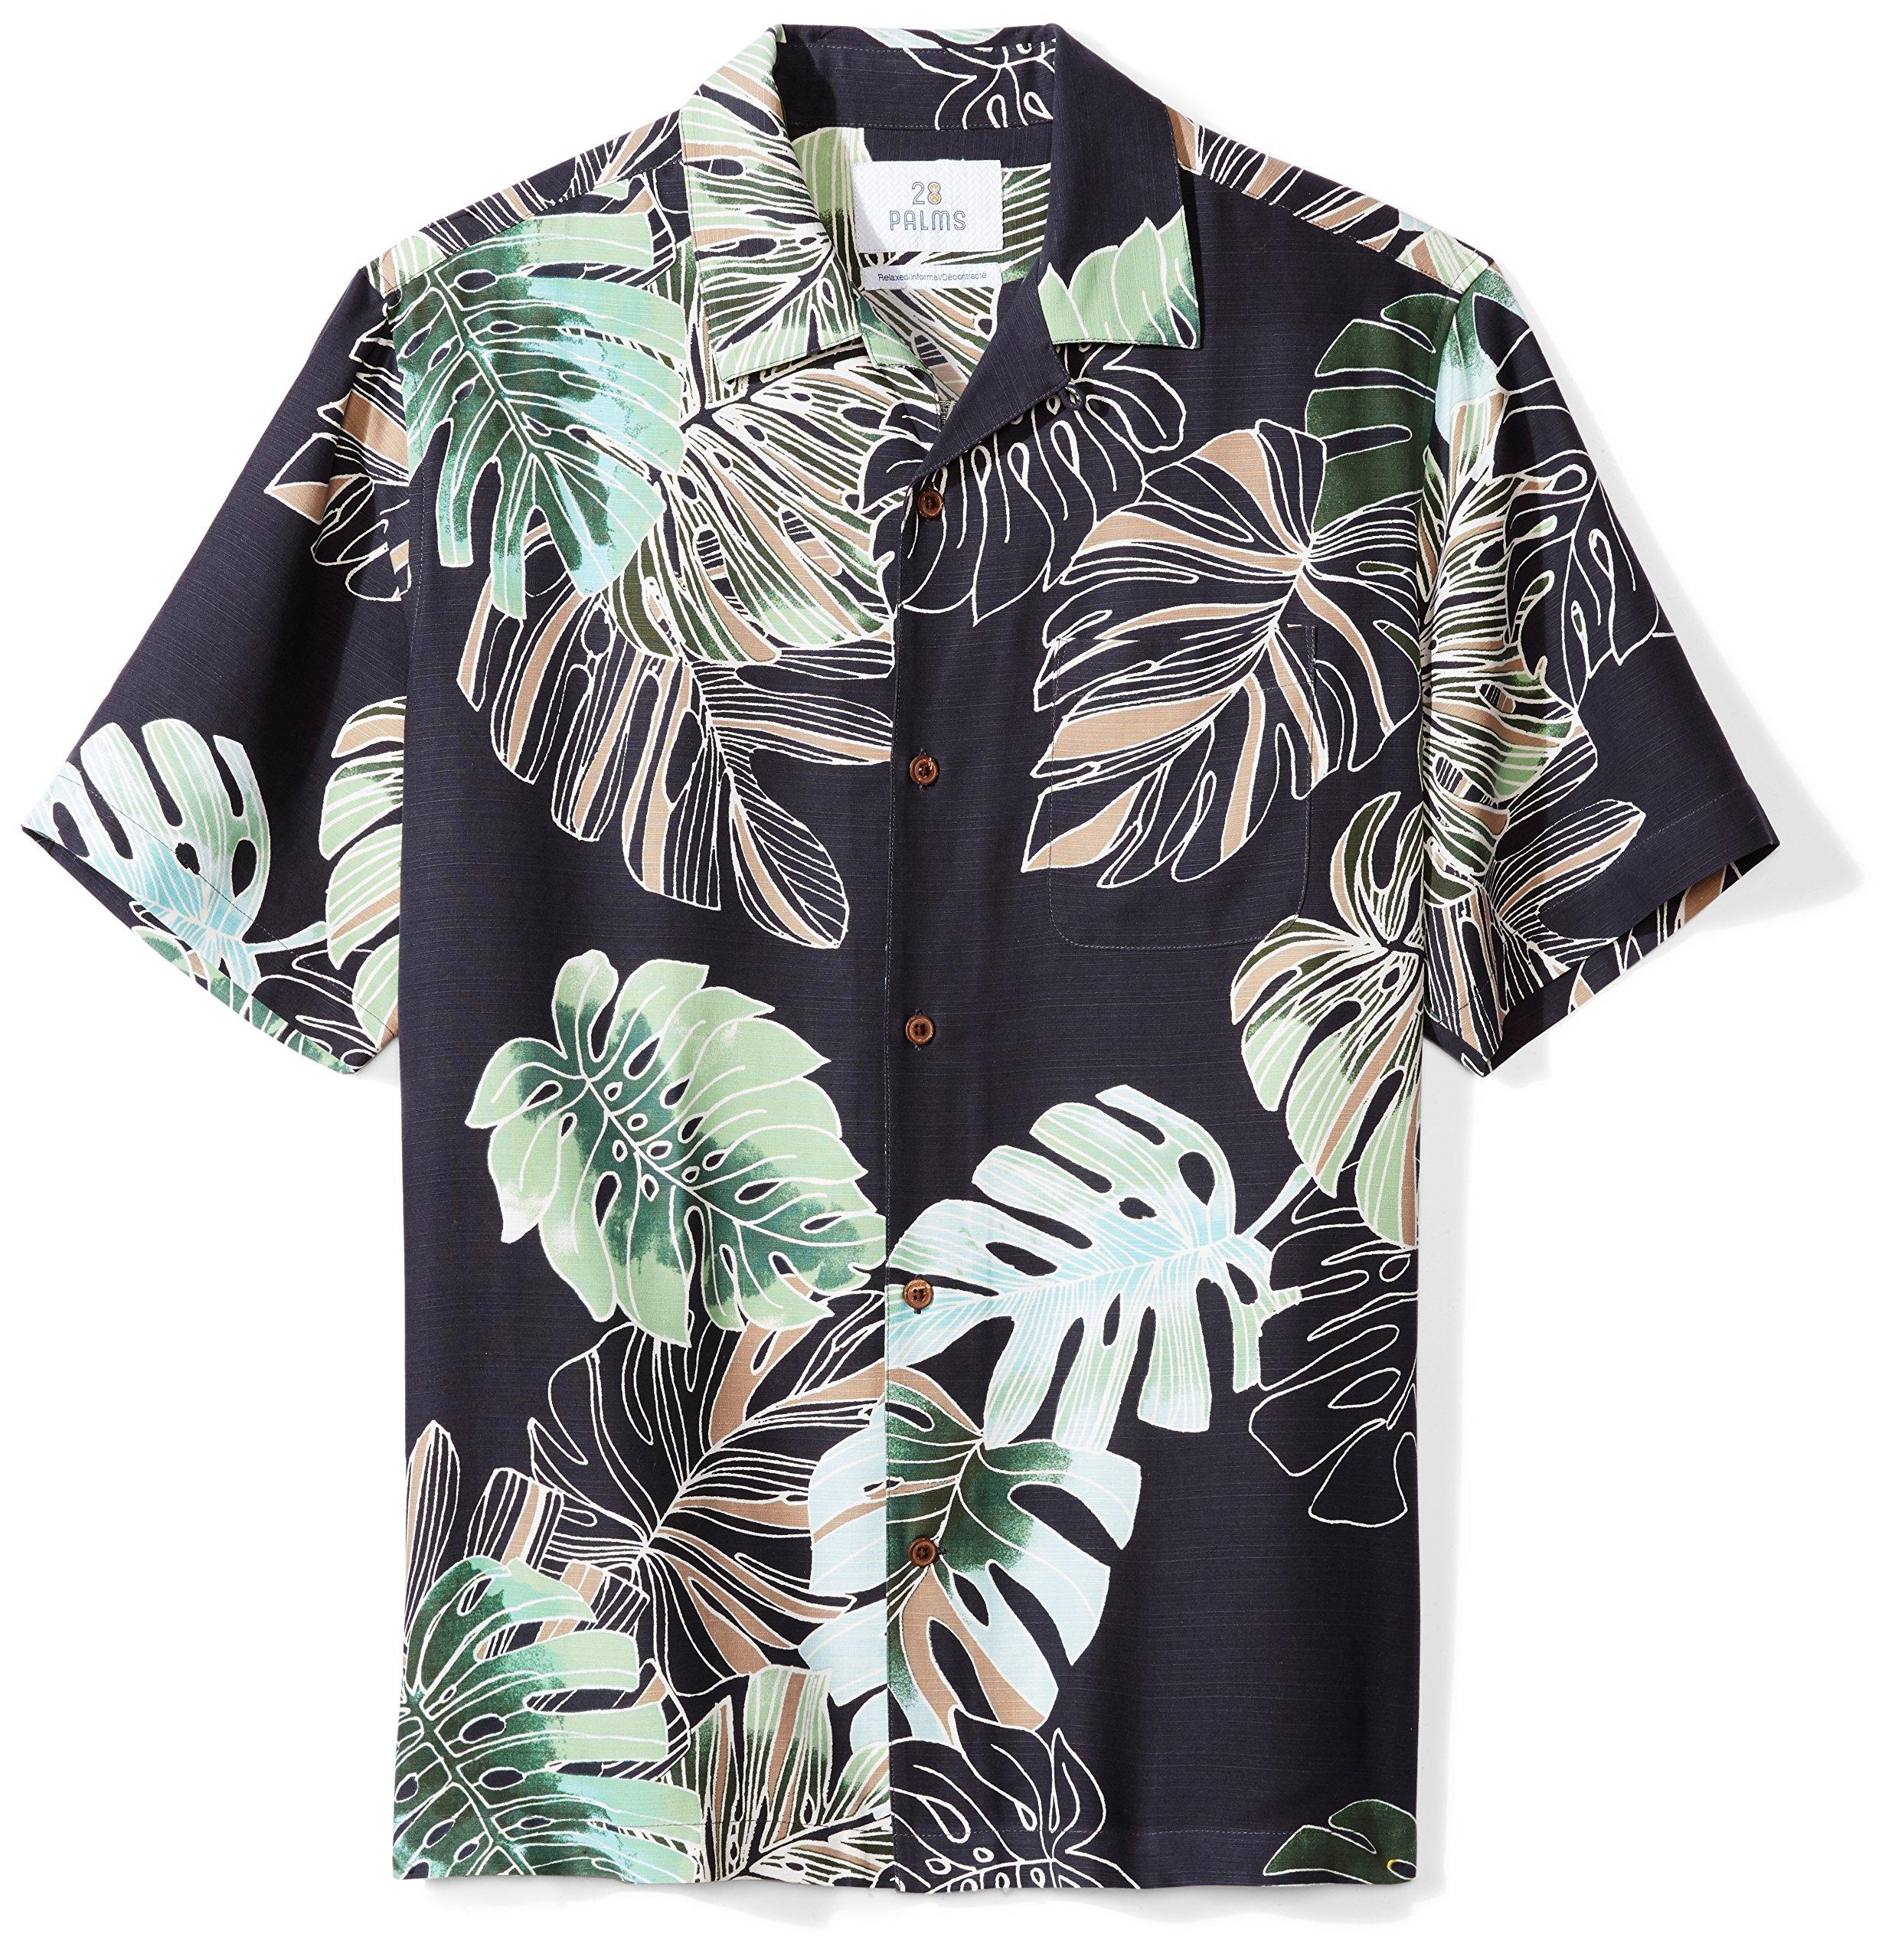 80a0cc29 Galleon - 28 Palms Men's Relaxed-Fit 100% Silk Tropical Hawaiian Shirt, Navy  Banana Leaf, X-Large